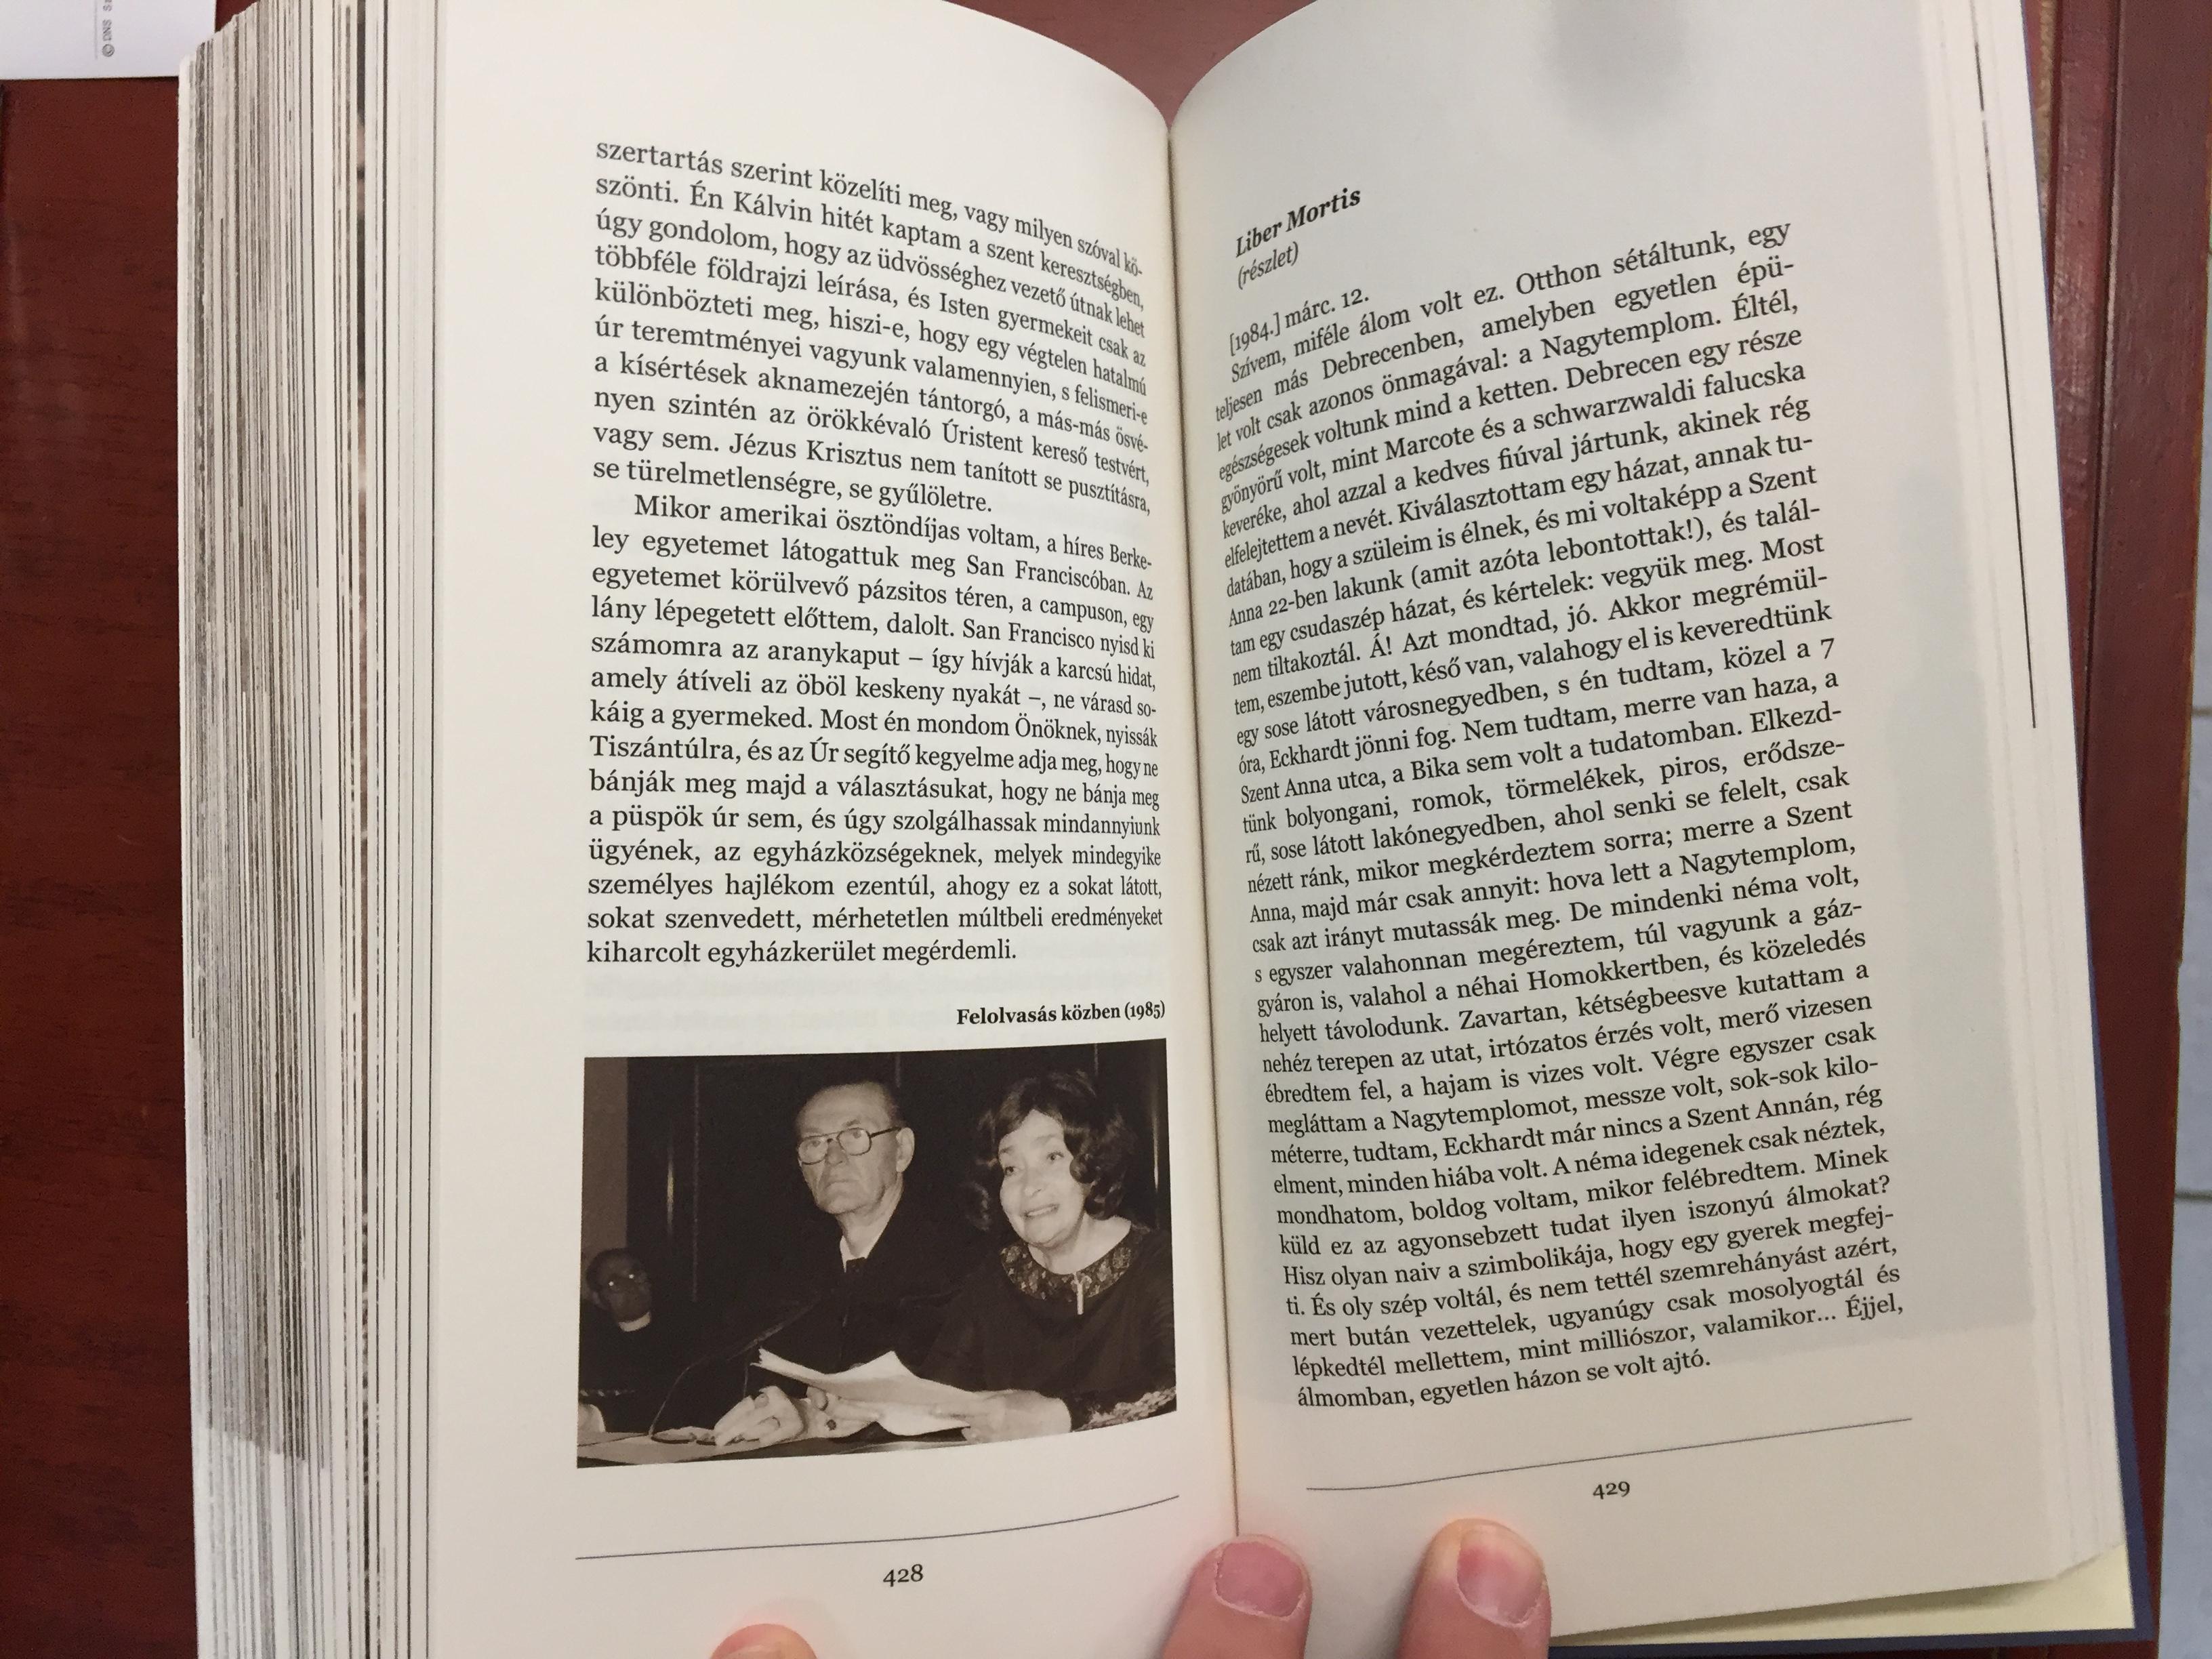 szab-magda-debrecene-irodalmi-tikalauz-hungarian-language-literary-guide-to-the-city-of-debrecen-debreceni-reform-tus-koll-gium-m-zeuma-hardcover-2018-9-.jpg